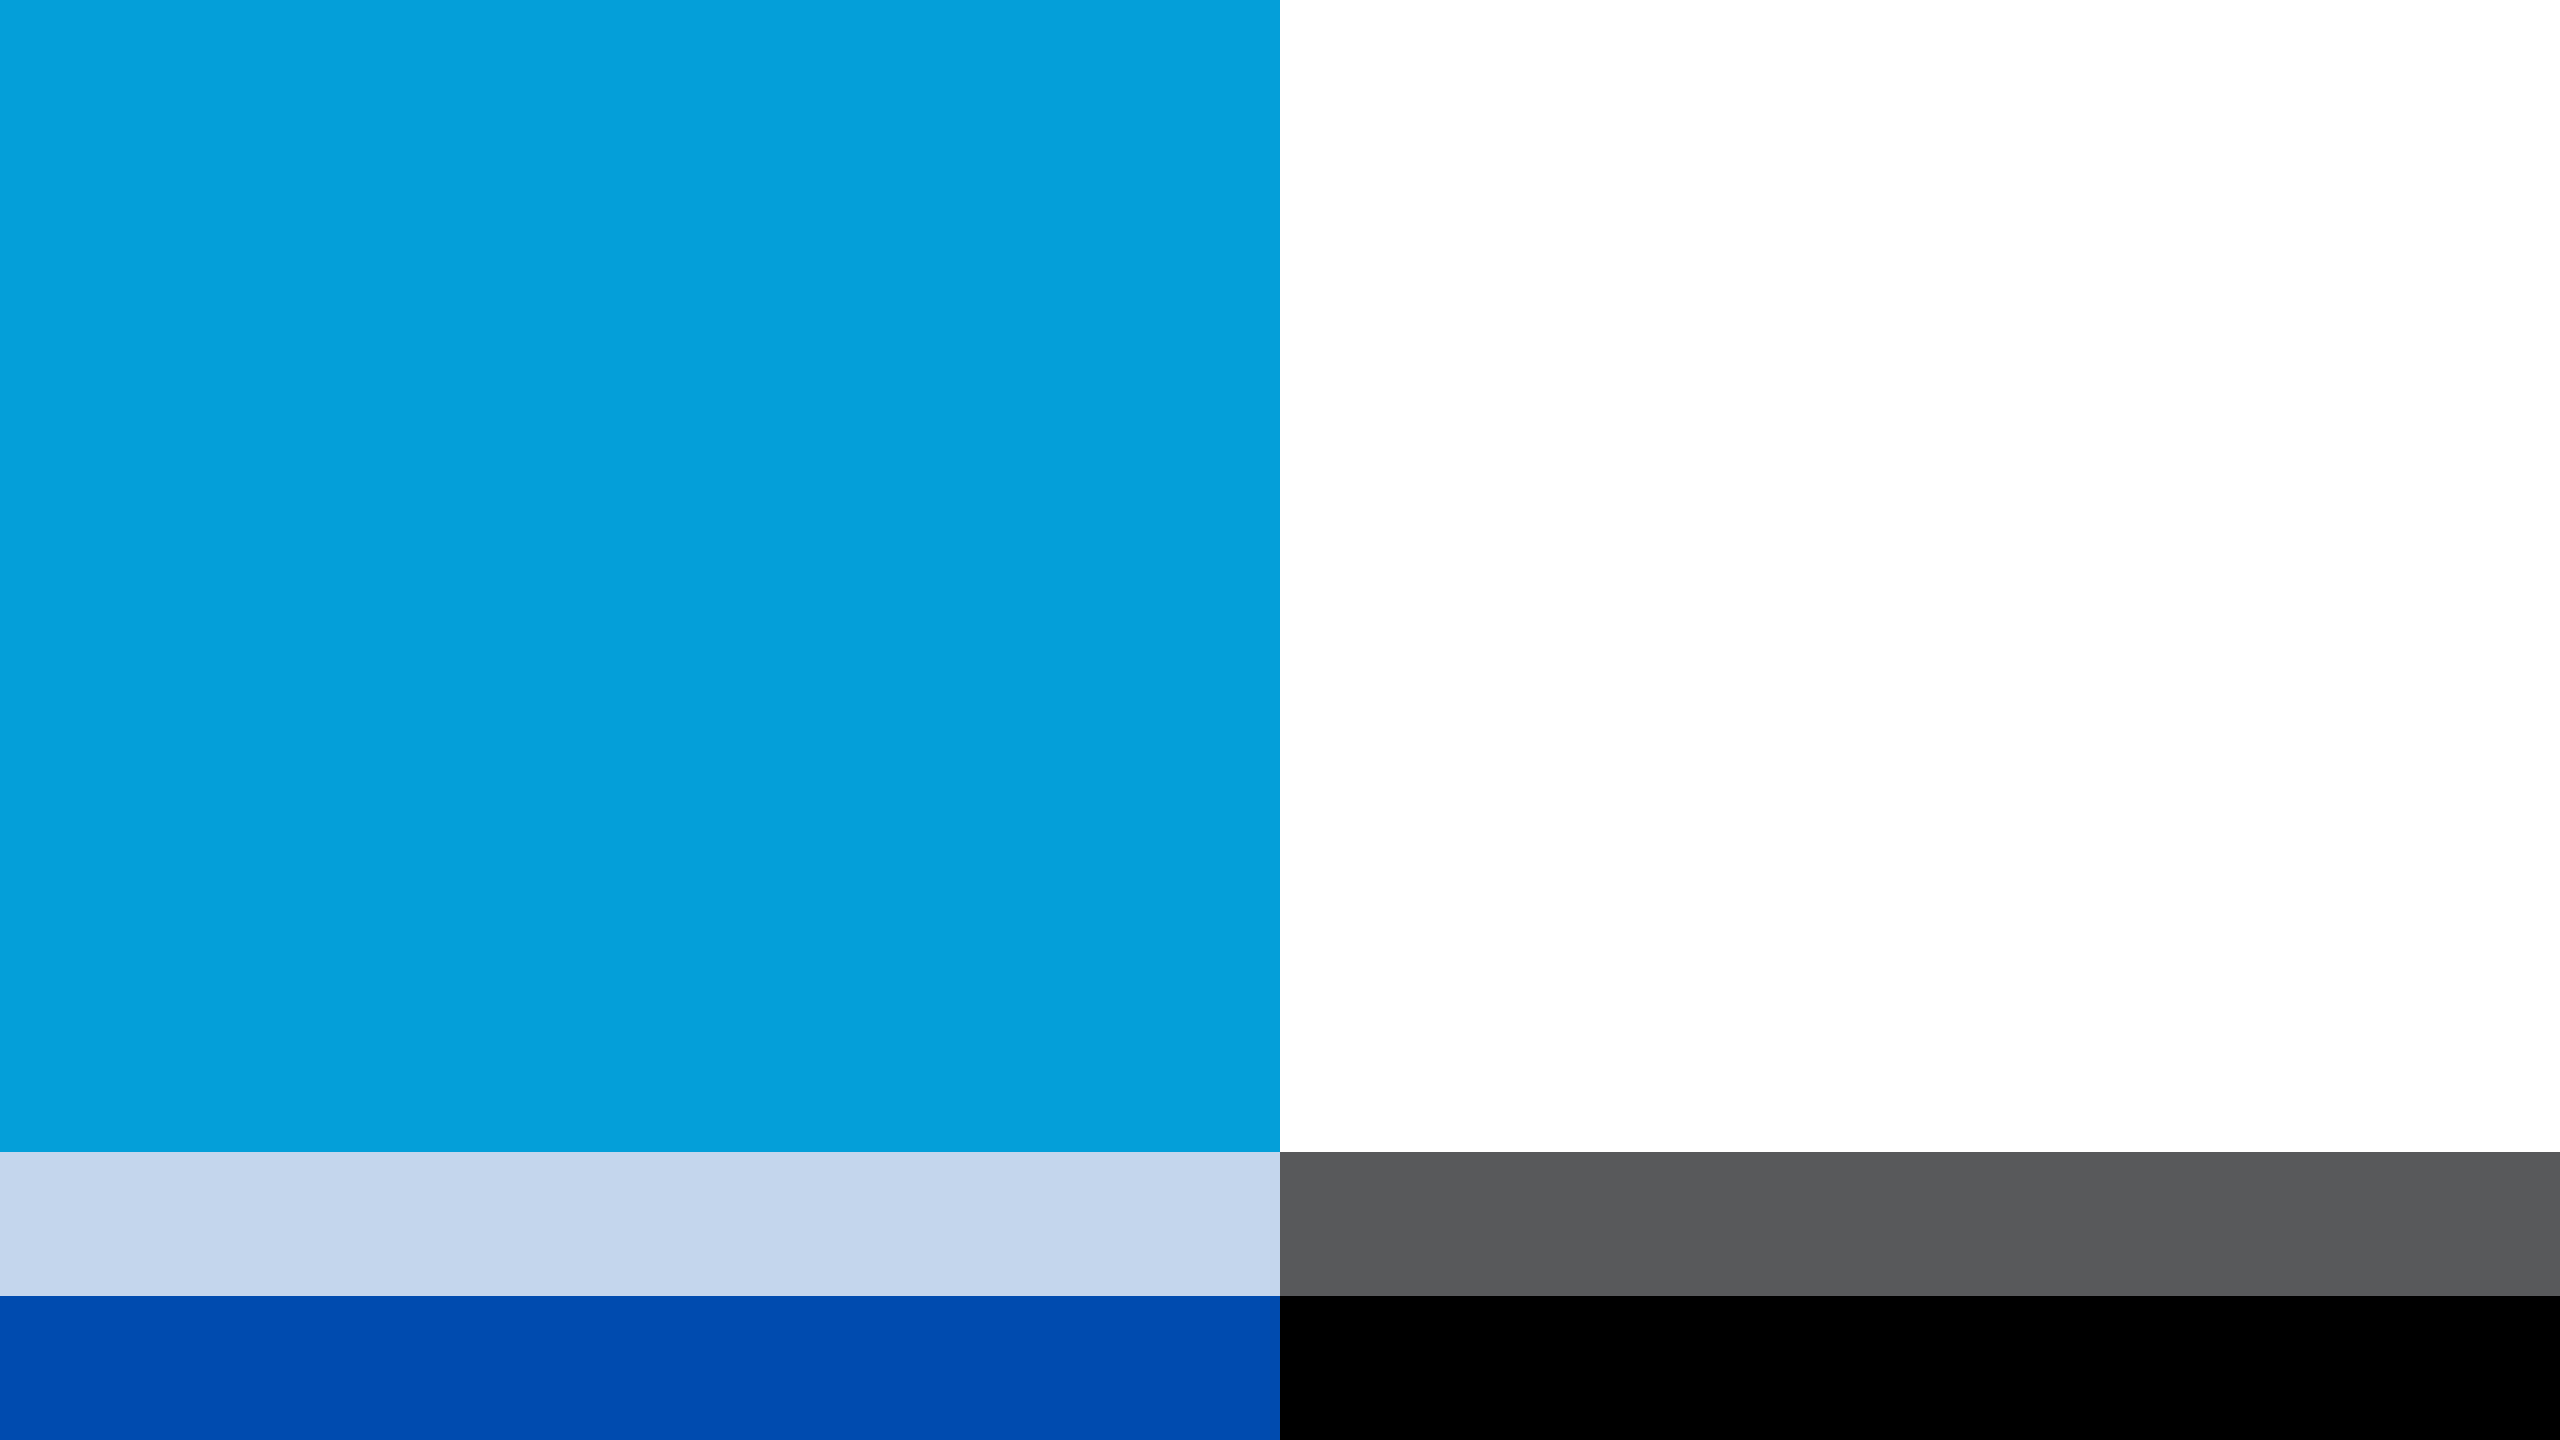 blue and gray Cisco brand palette